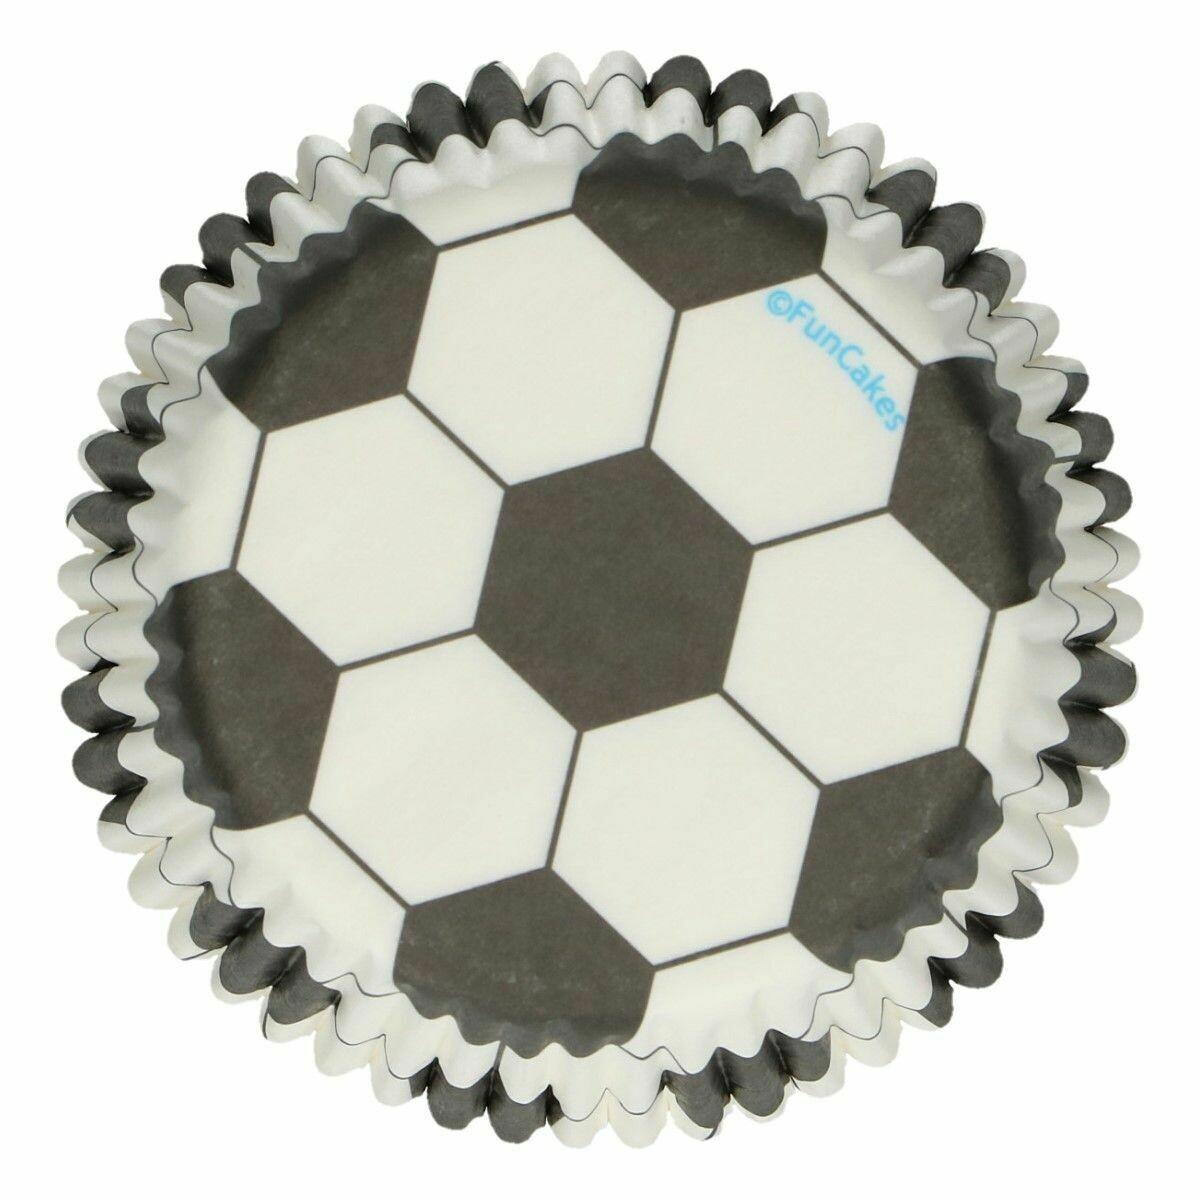 FunCakes Cupcake Cases -SOCCER/FOOTBALL -Θήκες Ψησίματος  Ποδόσφαιρο 48 τεμ